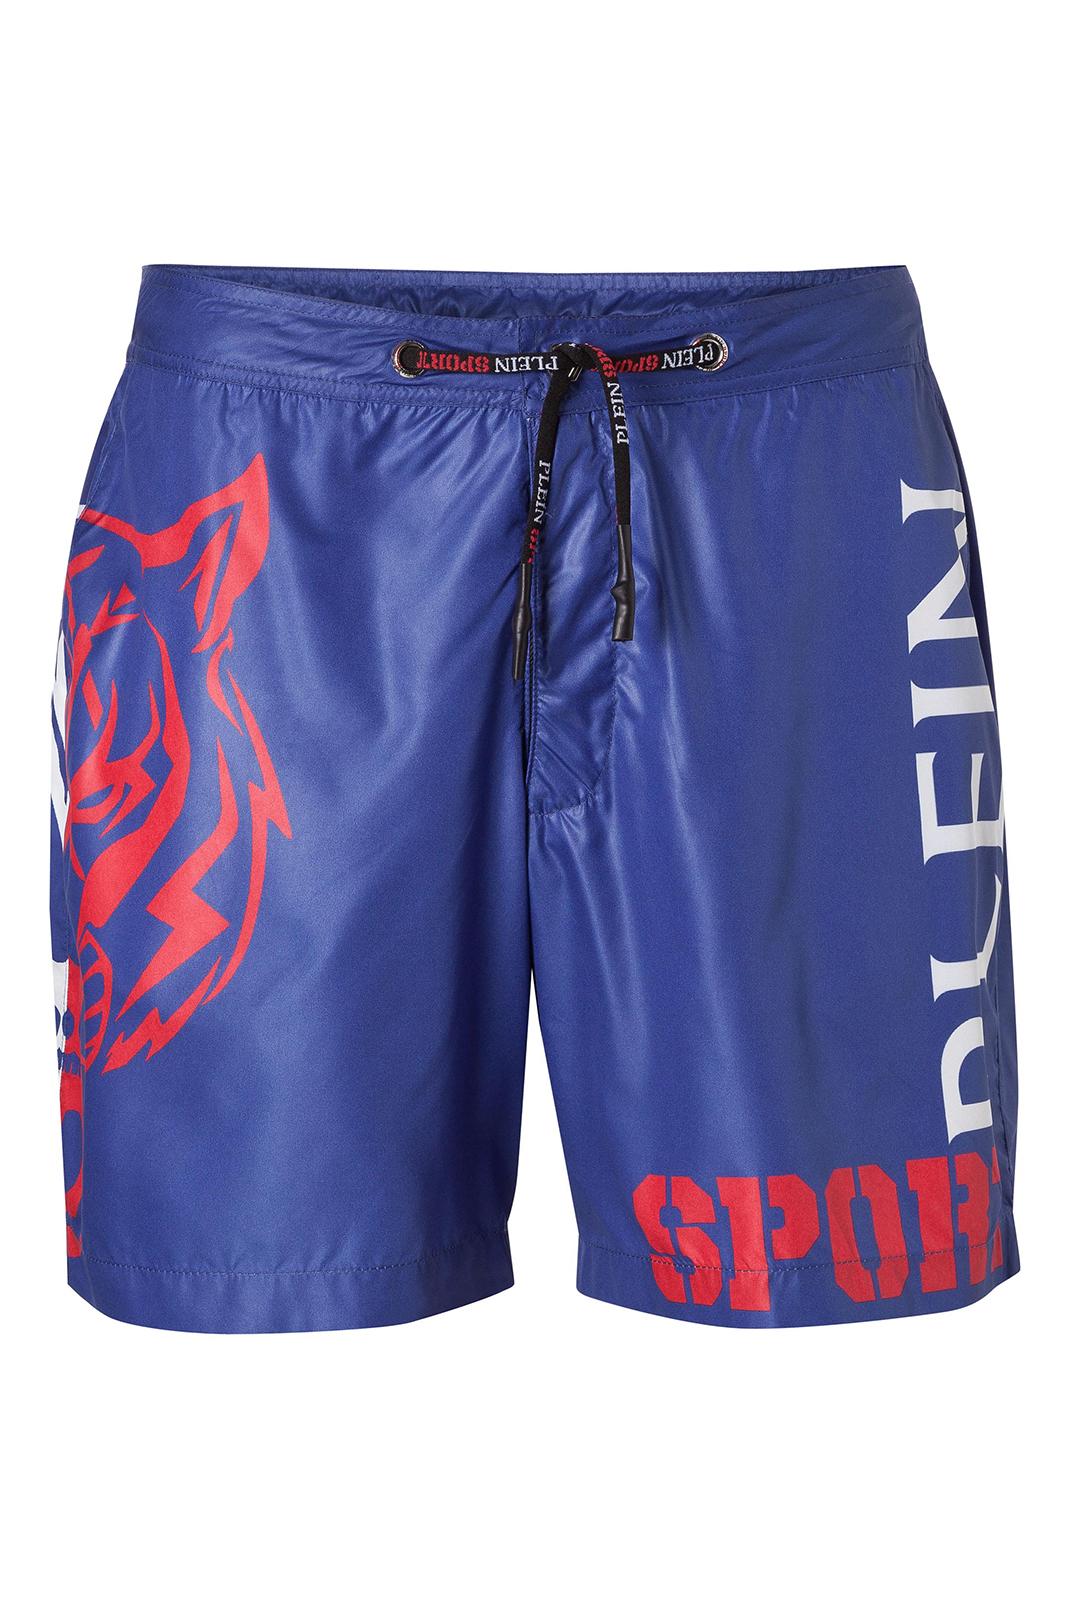 Shorts de bain  Plein Sport P17C MMT0033 B006 BLUE SUPERHERO